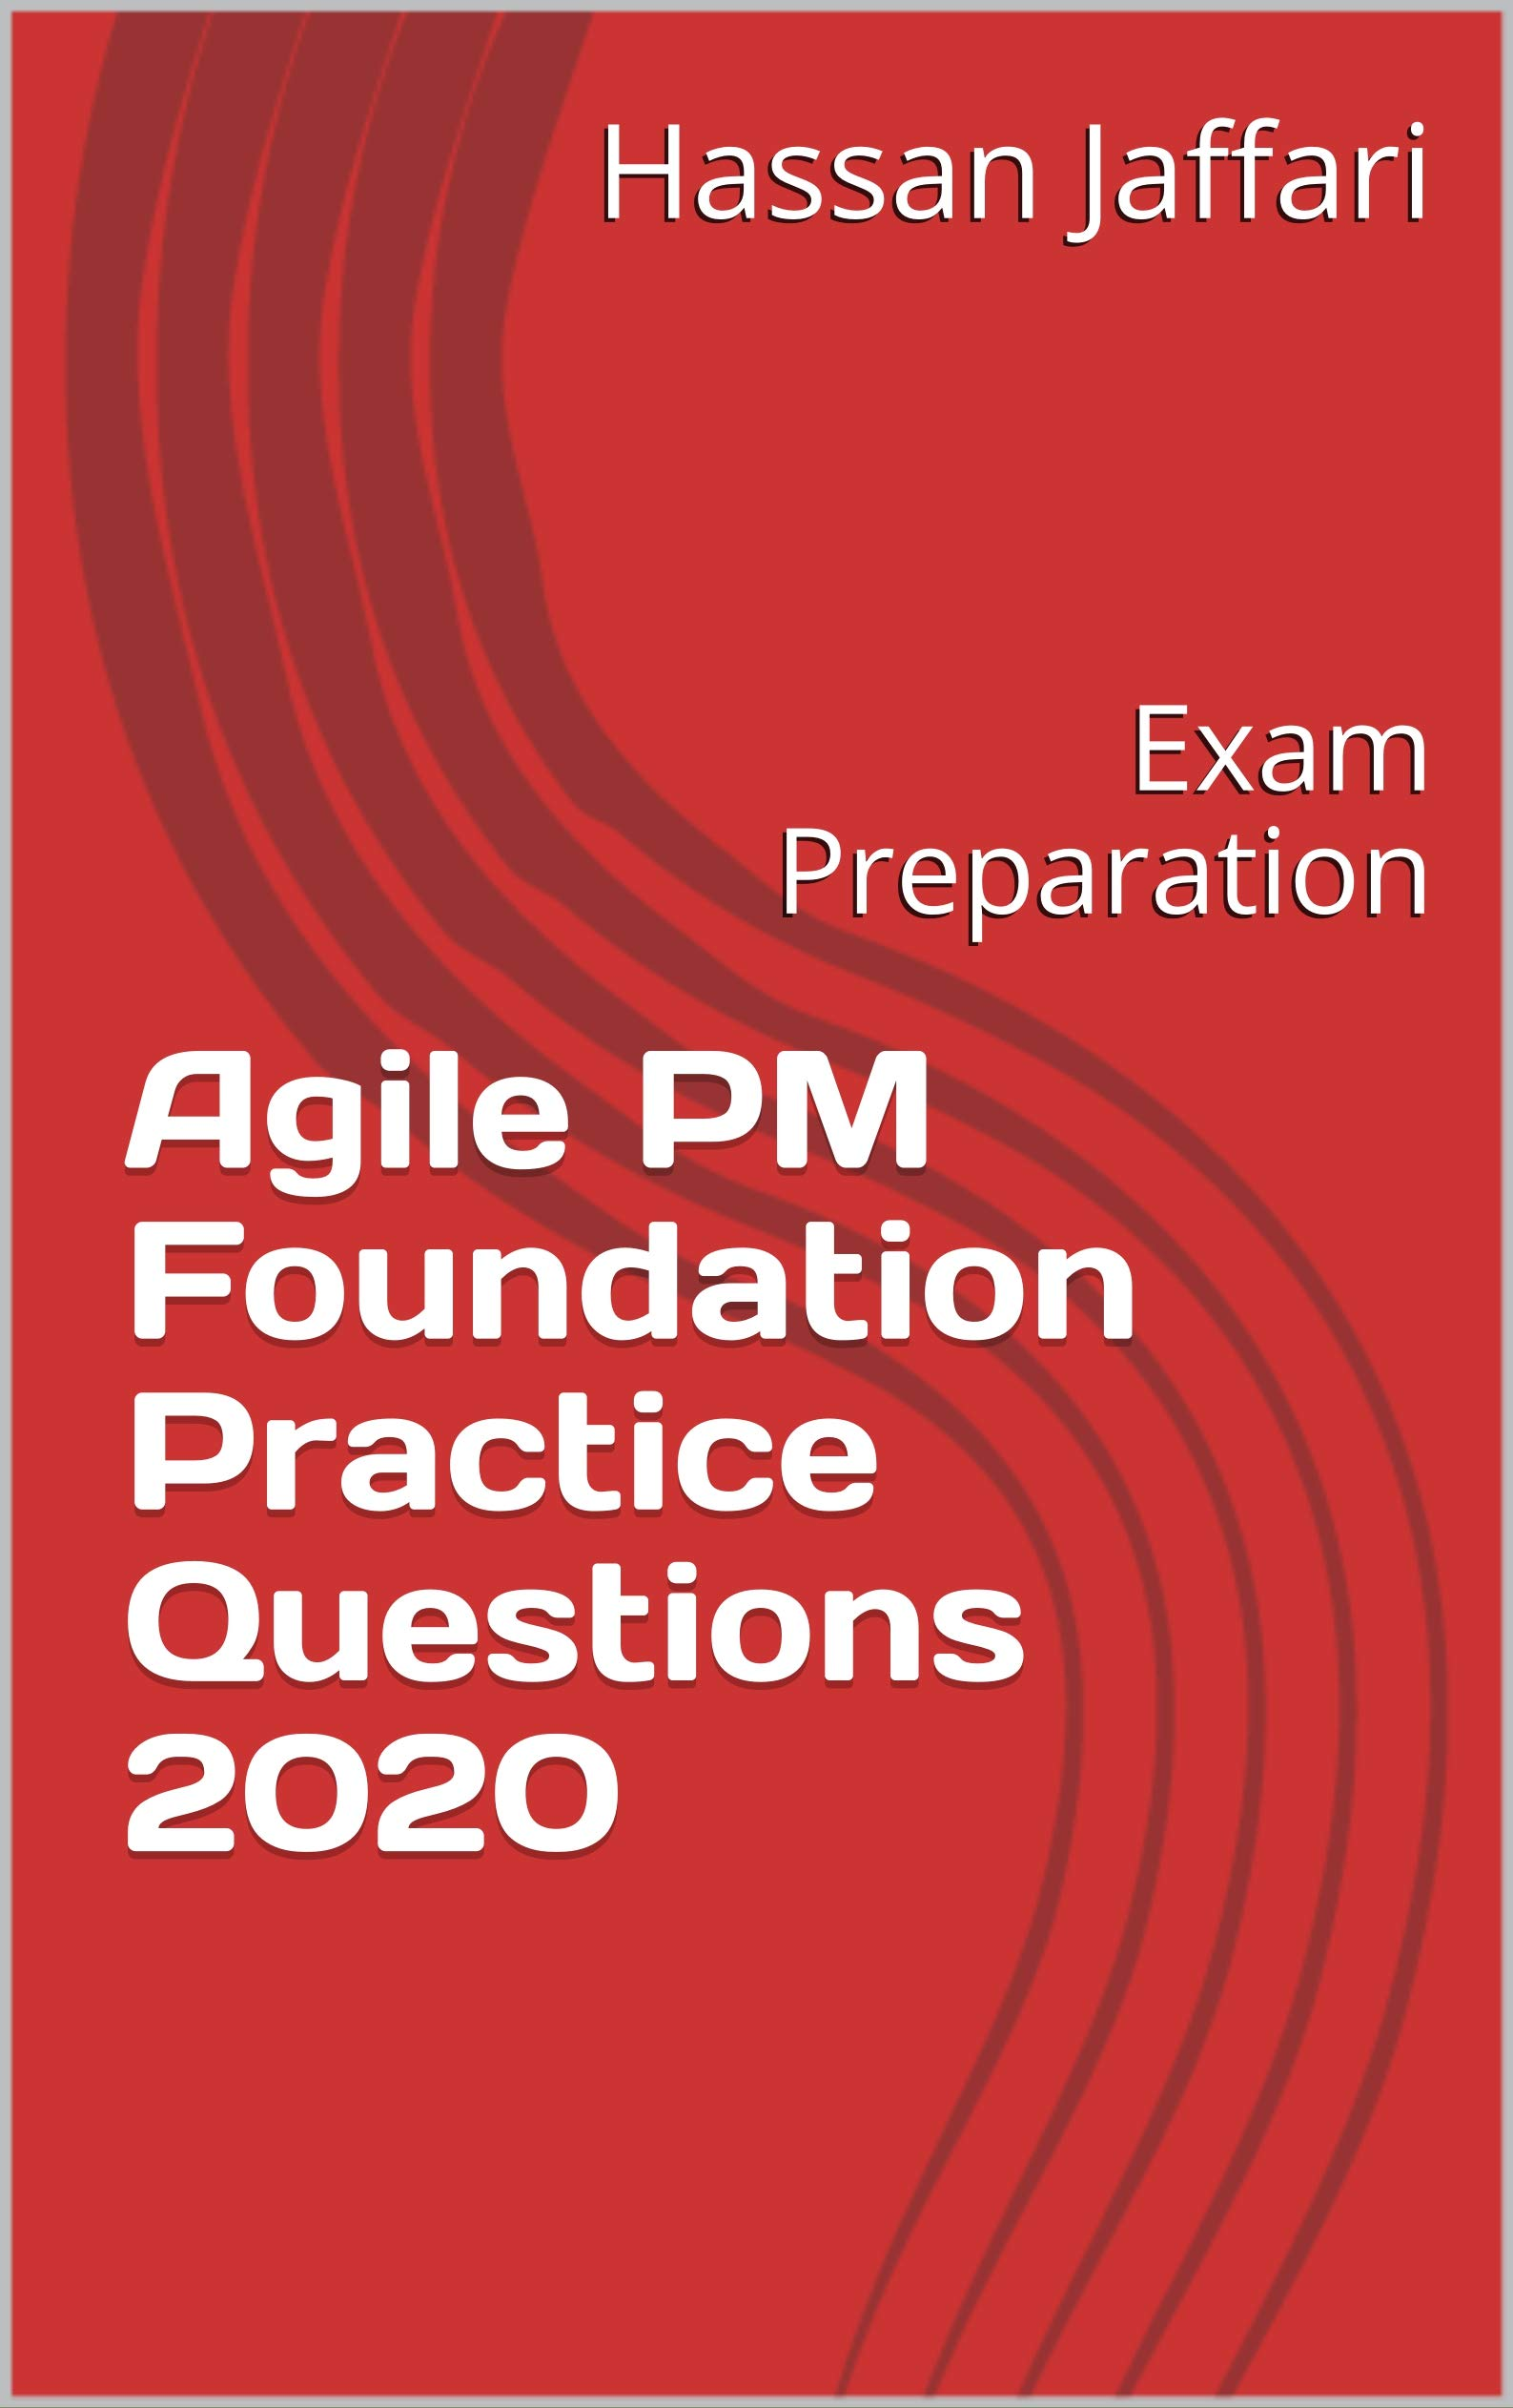 Agile PM Foundation Practice Questions 2020: Exam Preparation